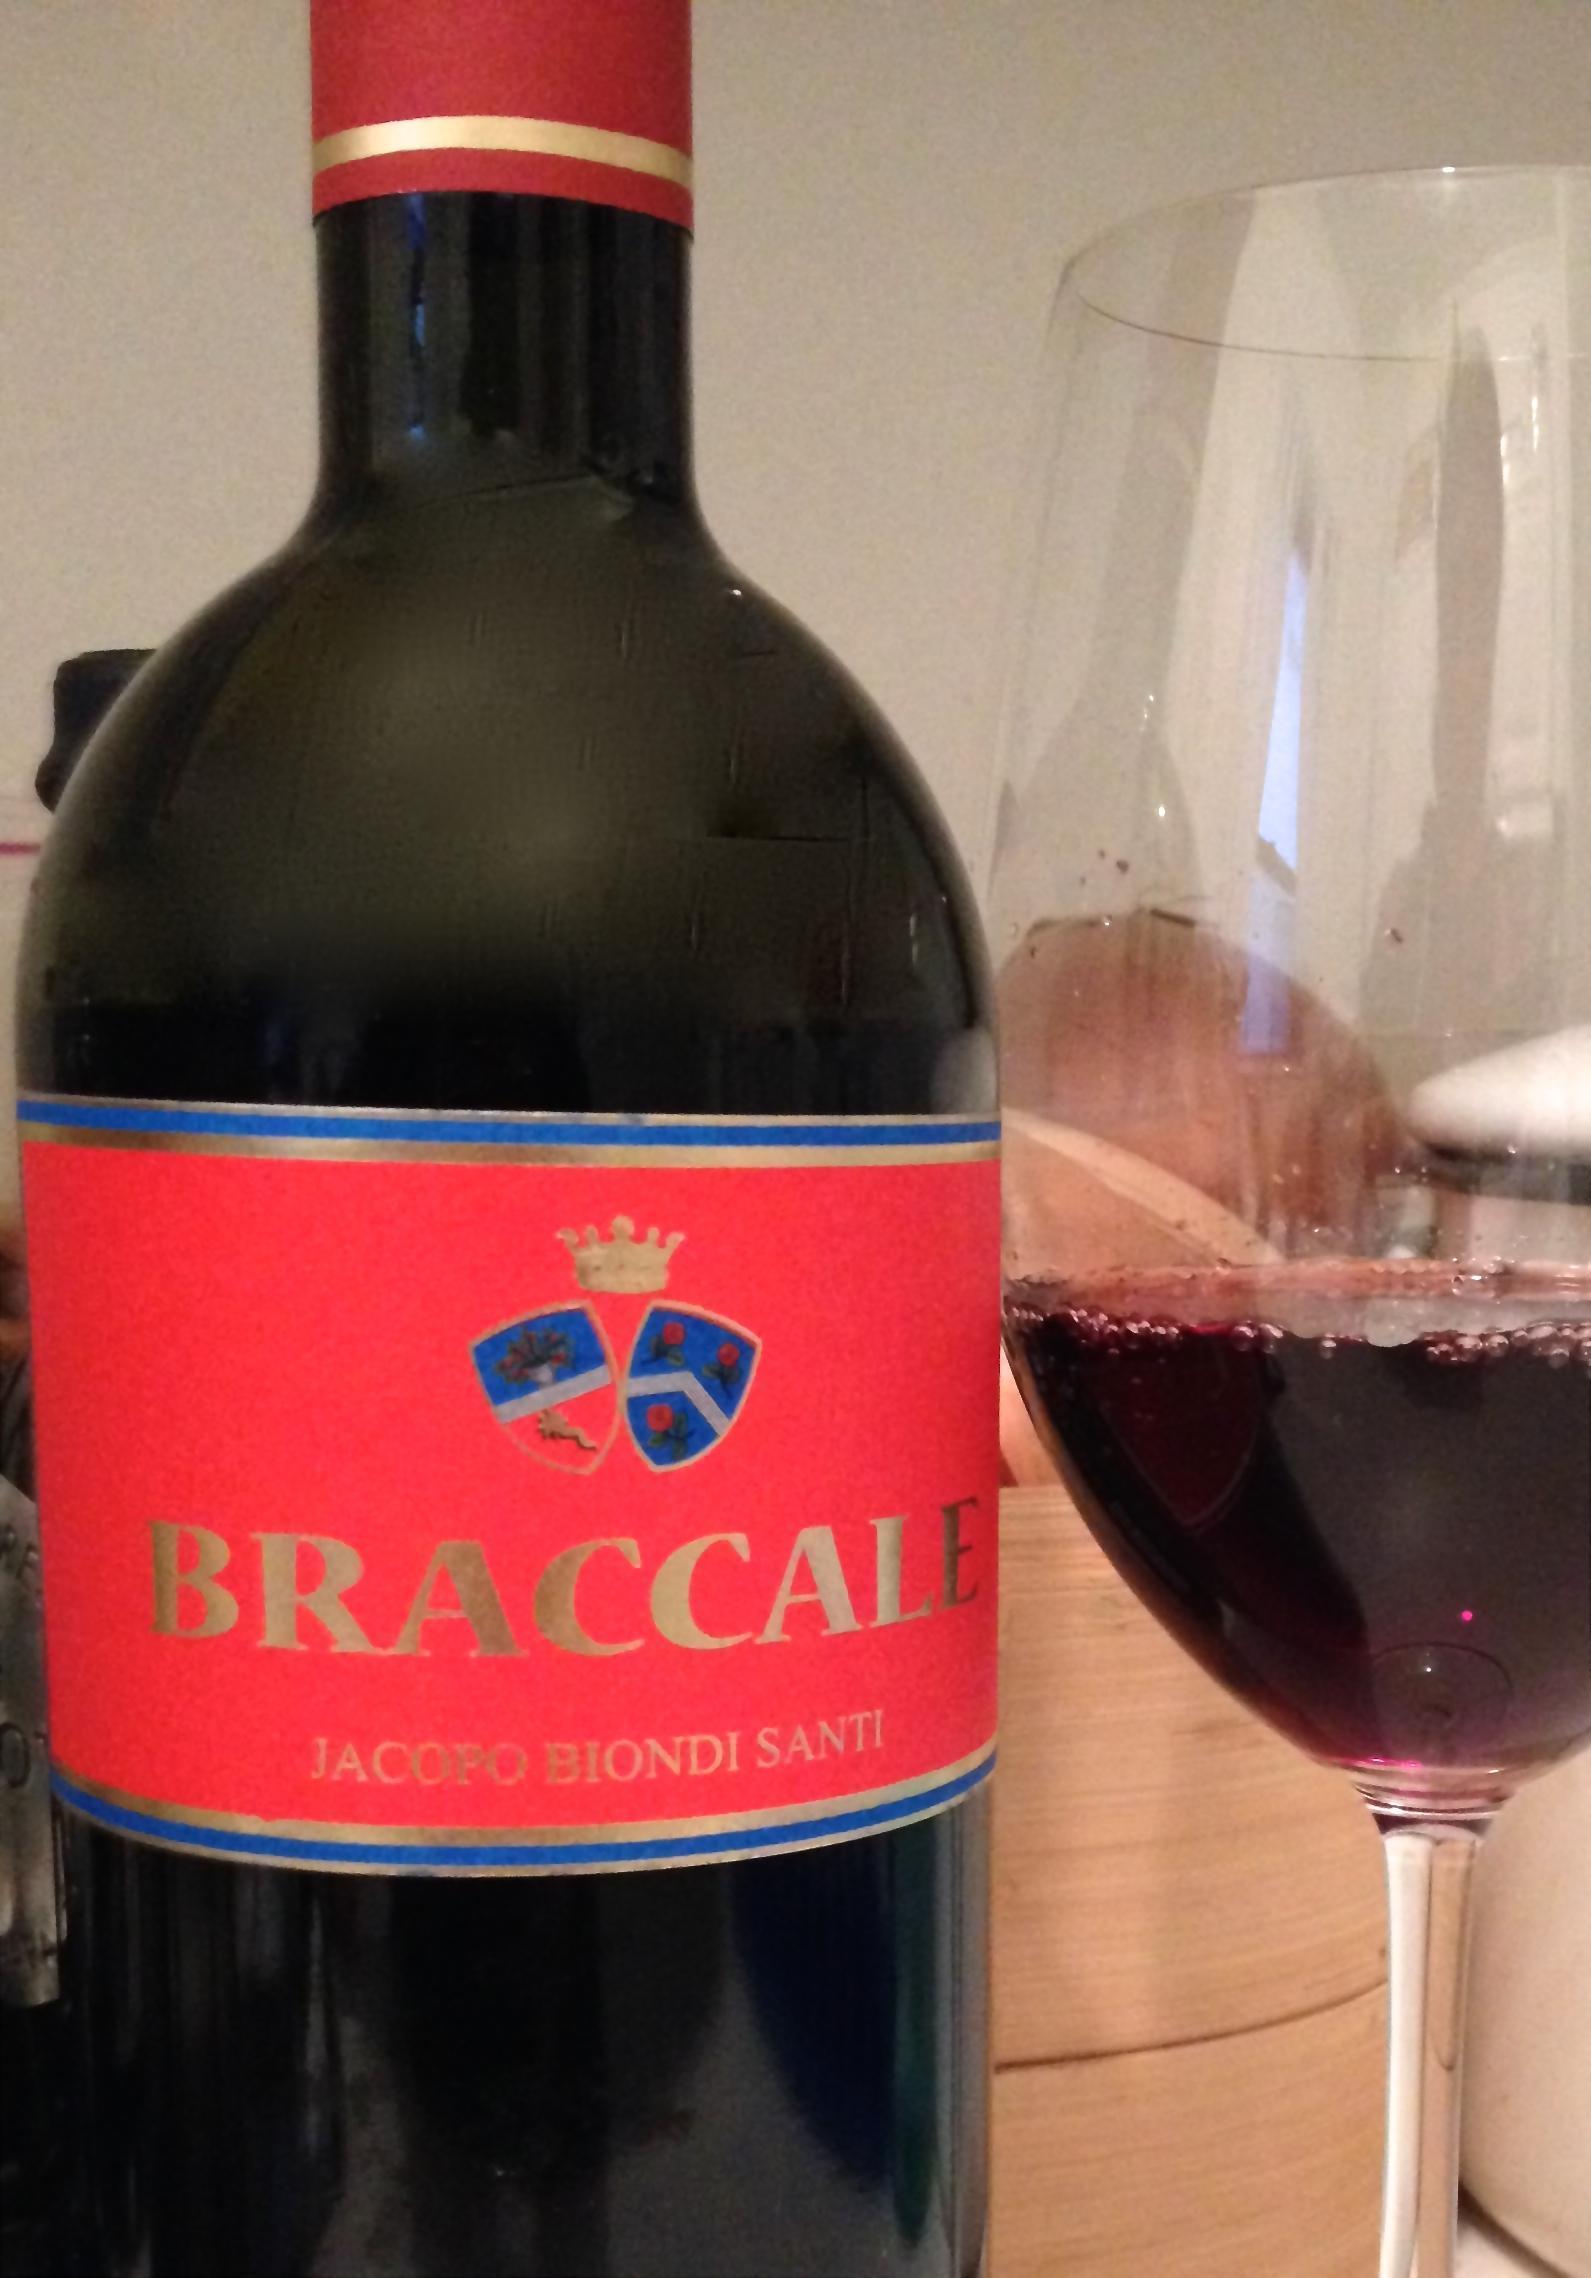 2011 Jacopo Biondi Santi Braccale Rosso 3